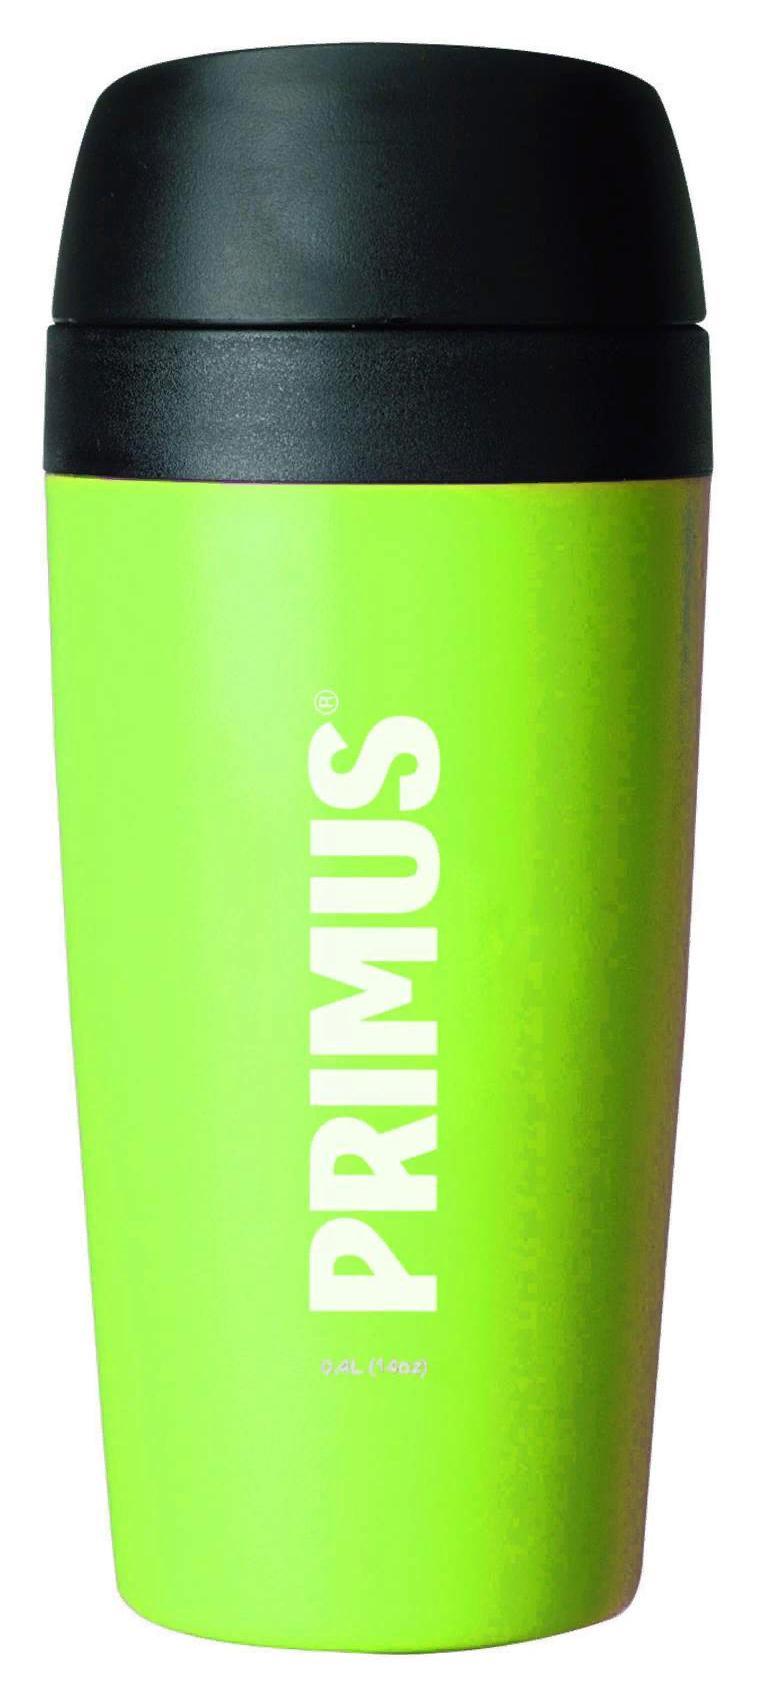 Термокружка Primus Commuter mug 0.4 Leaf Green, Посуда - арт. 1040650196